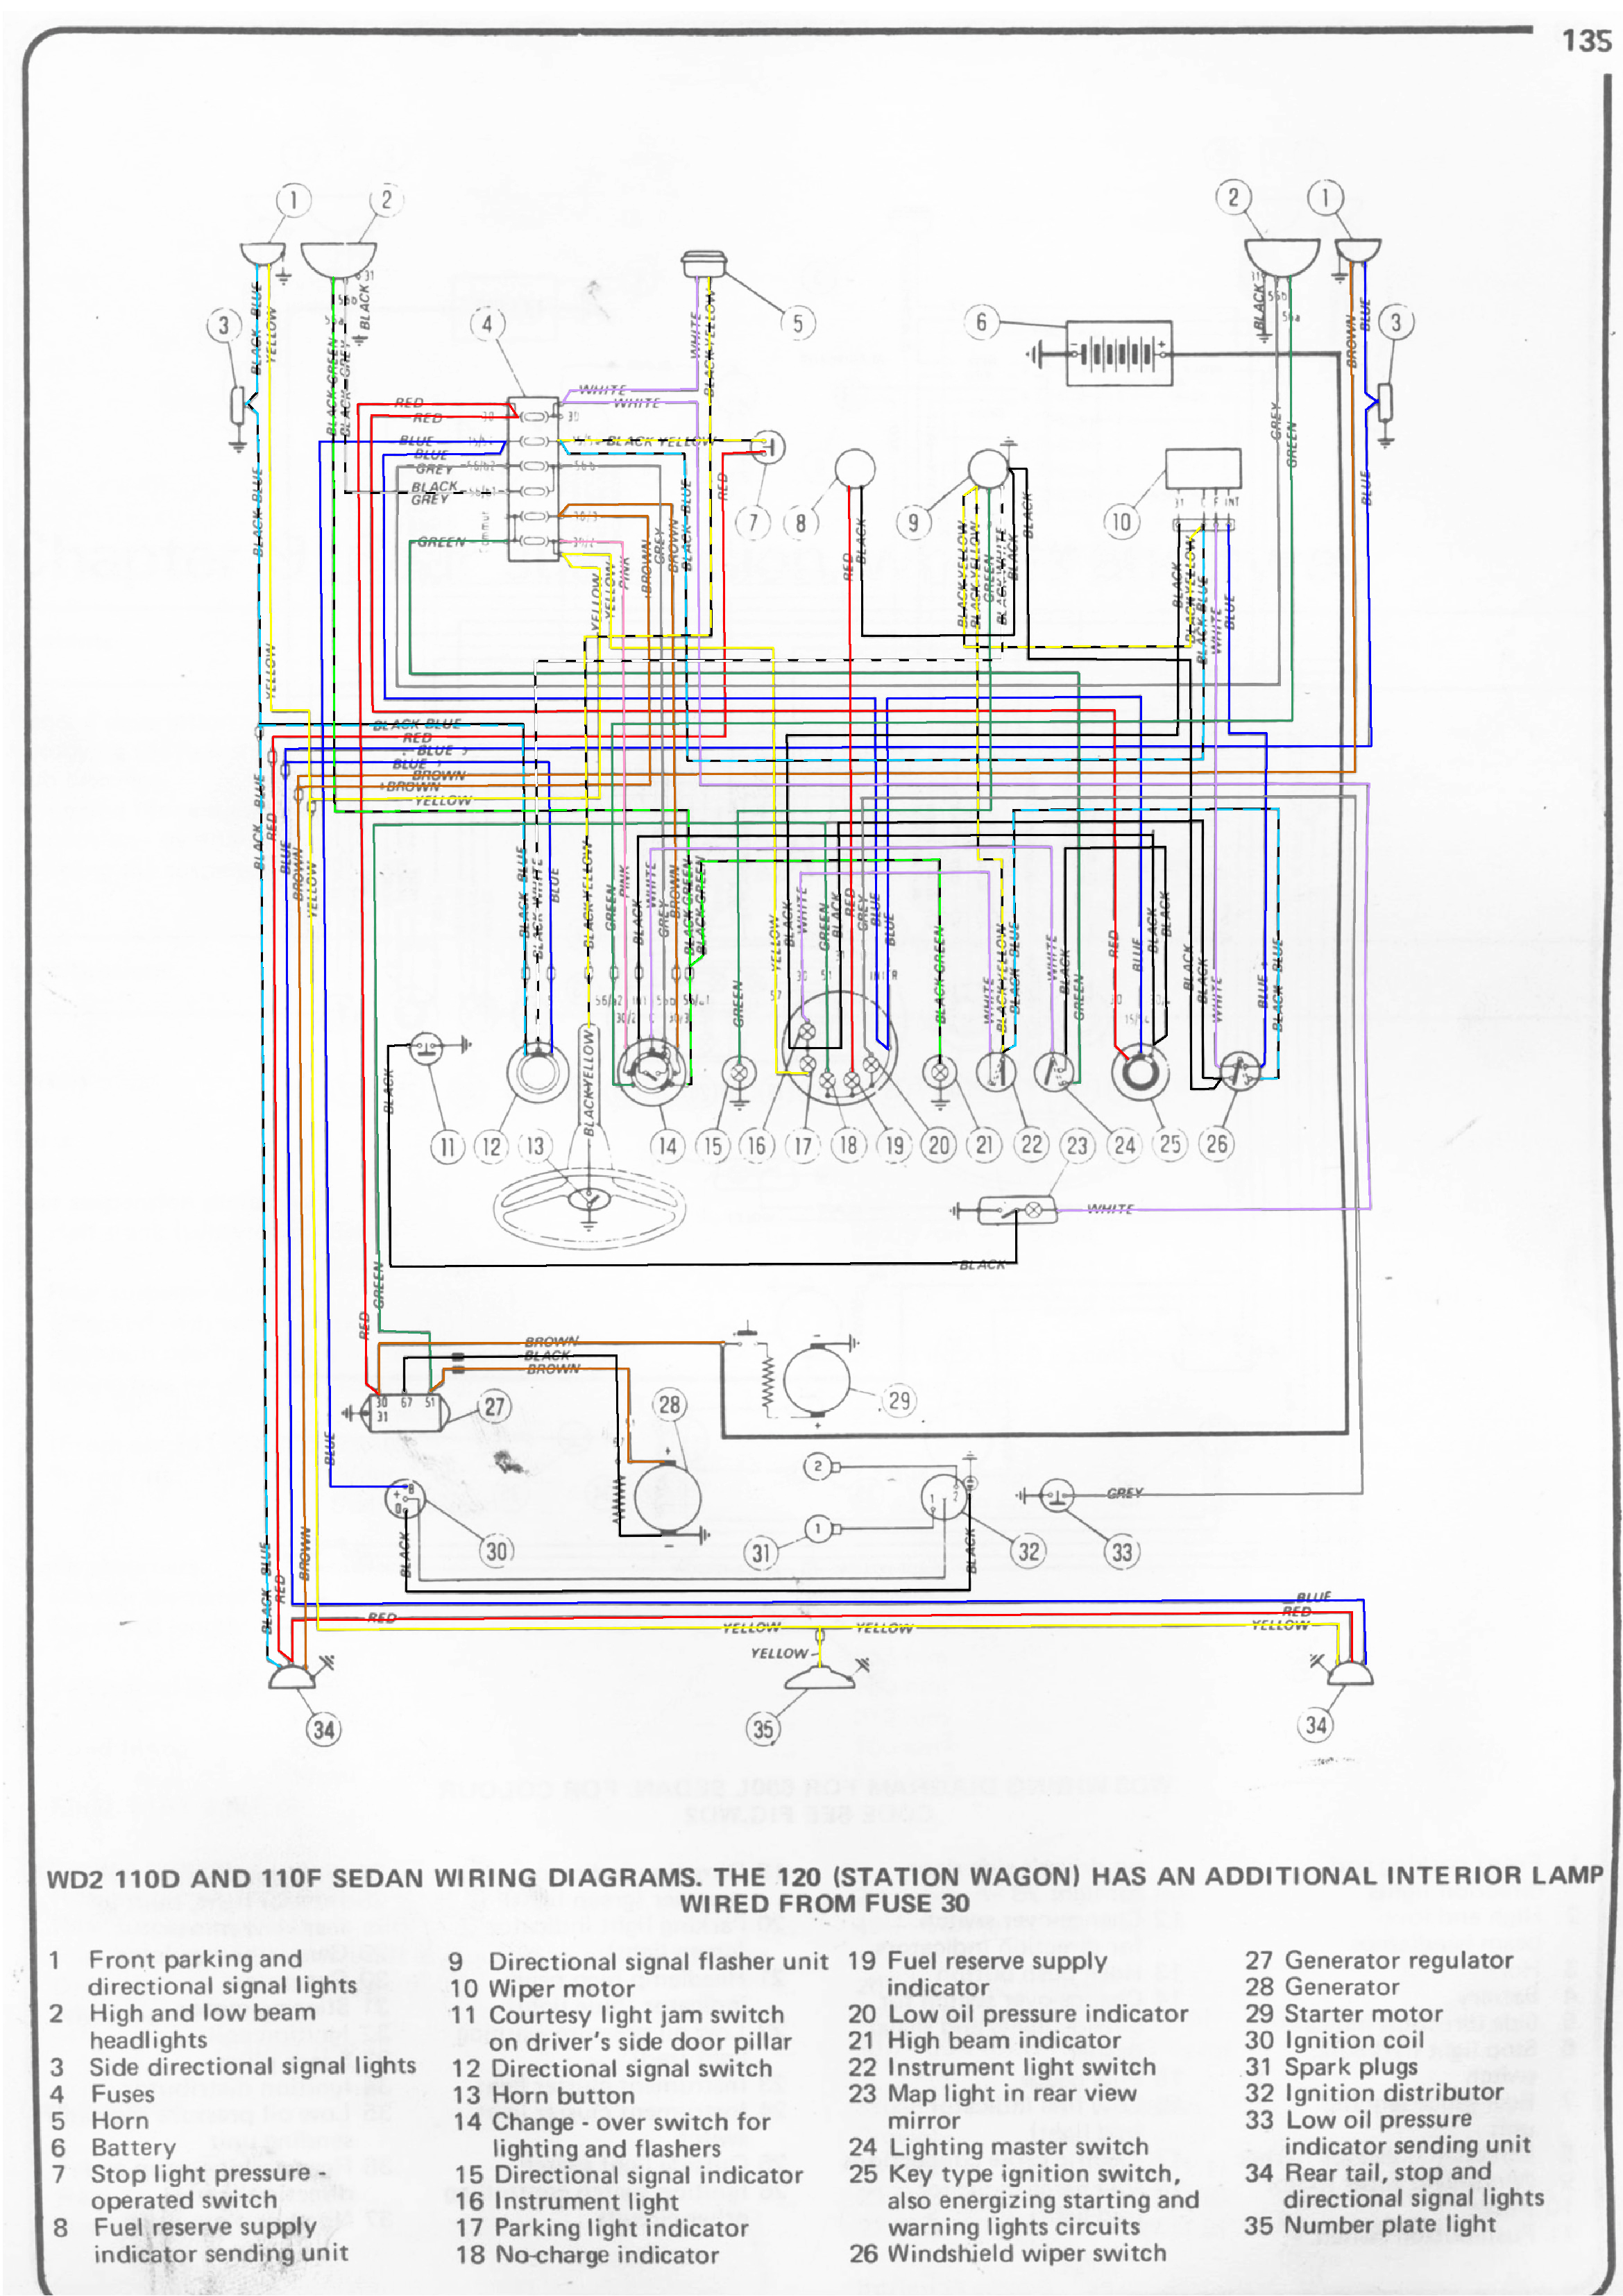 fiat 500l wiring diagram schema diagram preview fiat 500 l wiring diagram schema diagram preview fiat [ 2339 x 3309 Pixel ]